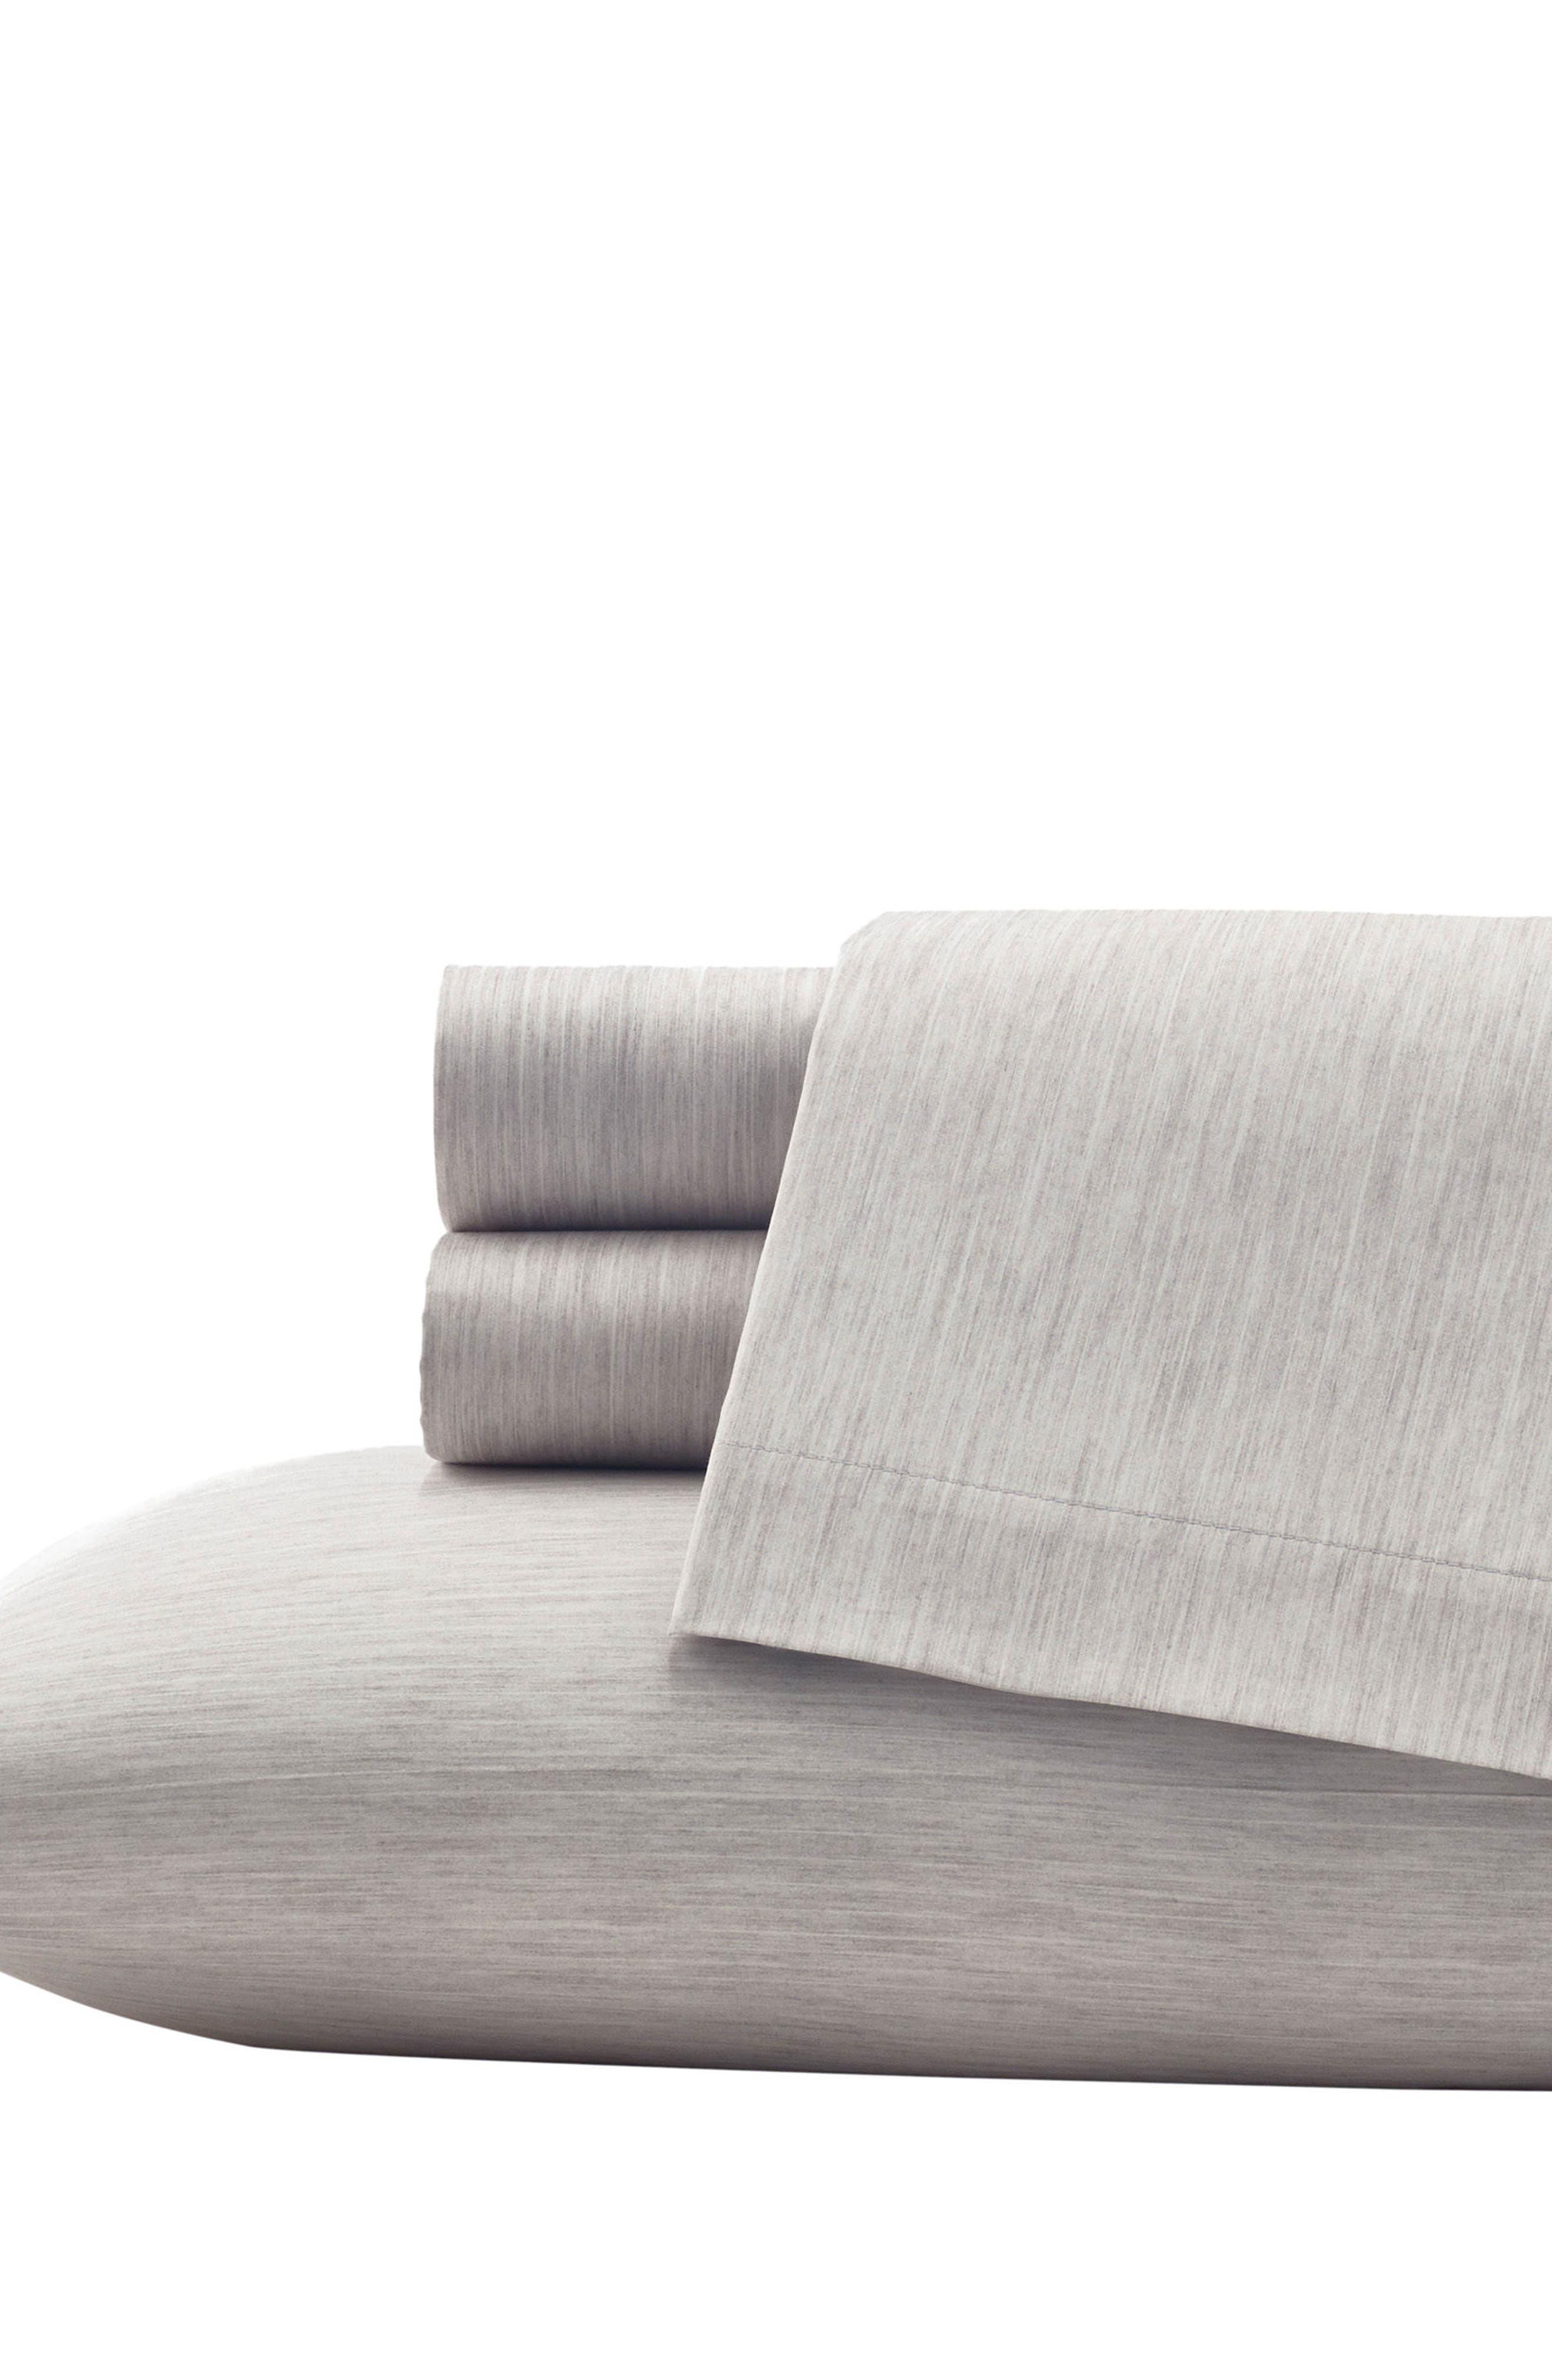 Marble Shibori 300 Thread Count Pillowcases,                         Main,                         color, Lt/ Gray